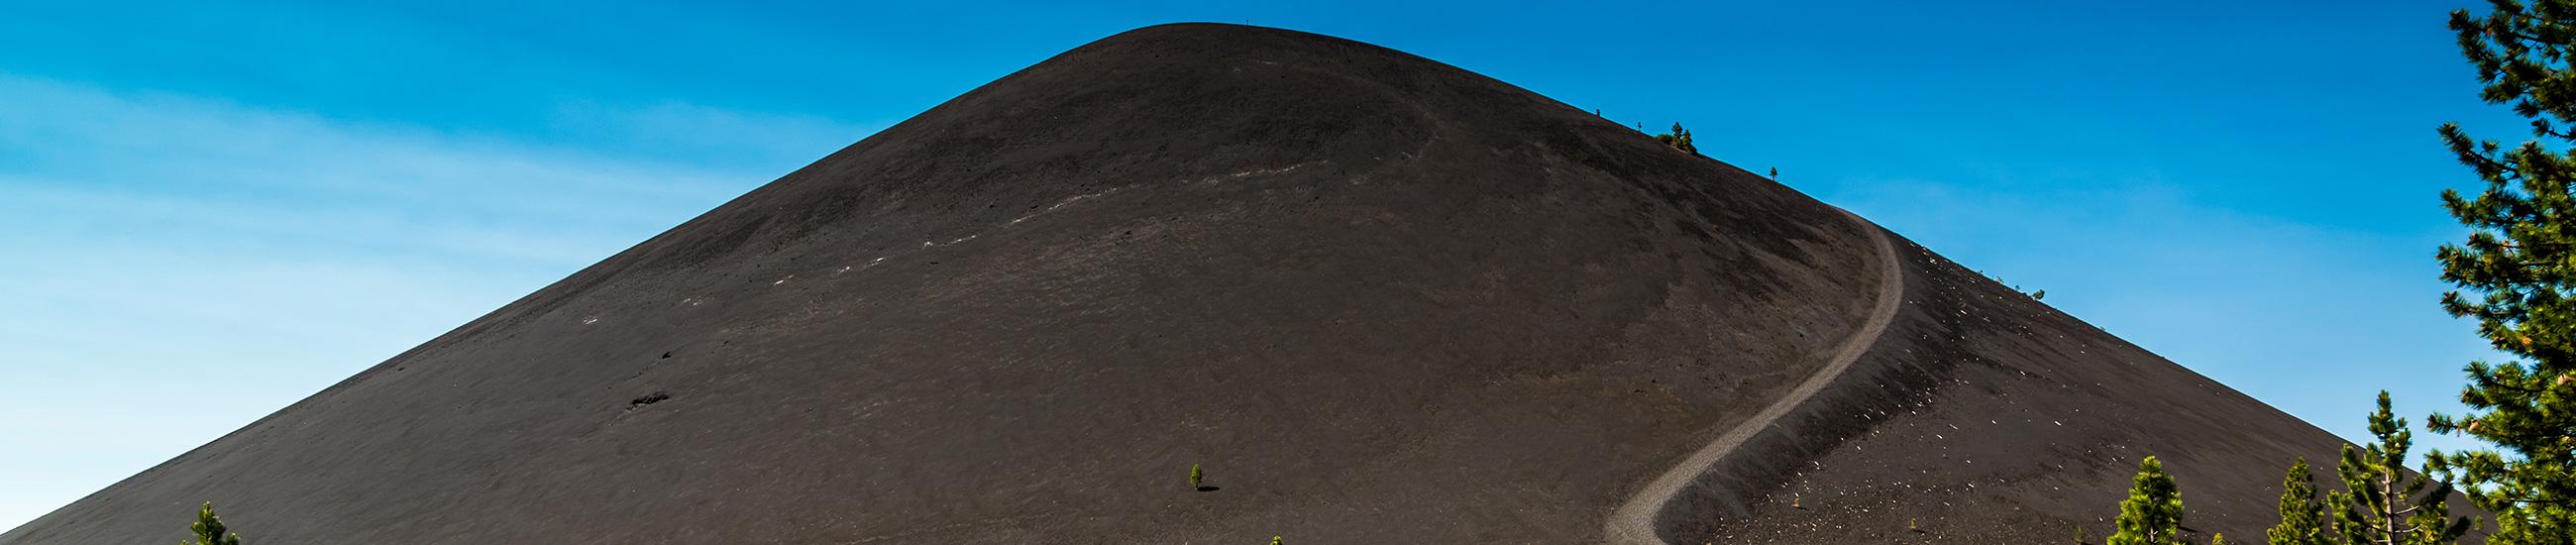 Cinder Cone, Lassen Volcanic